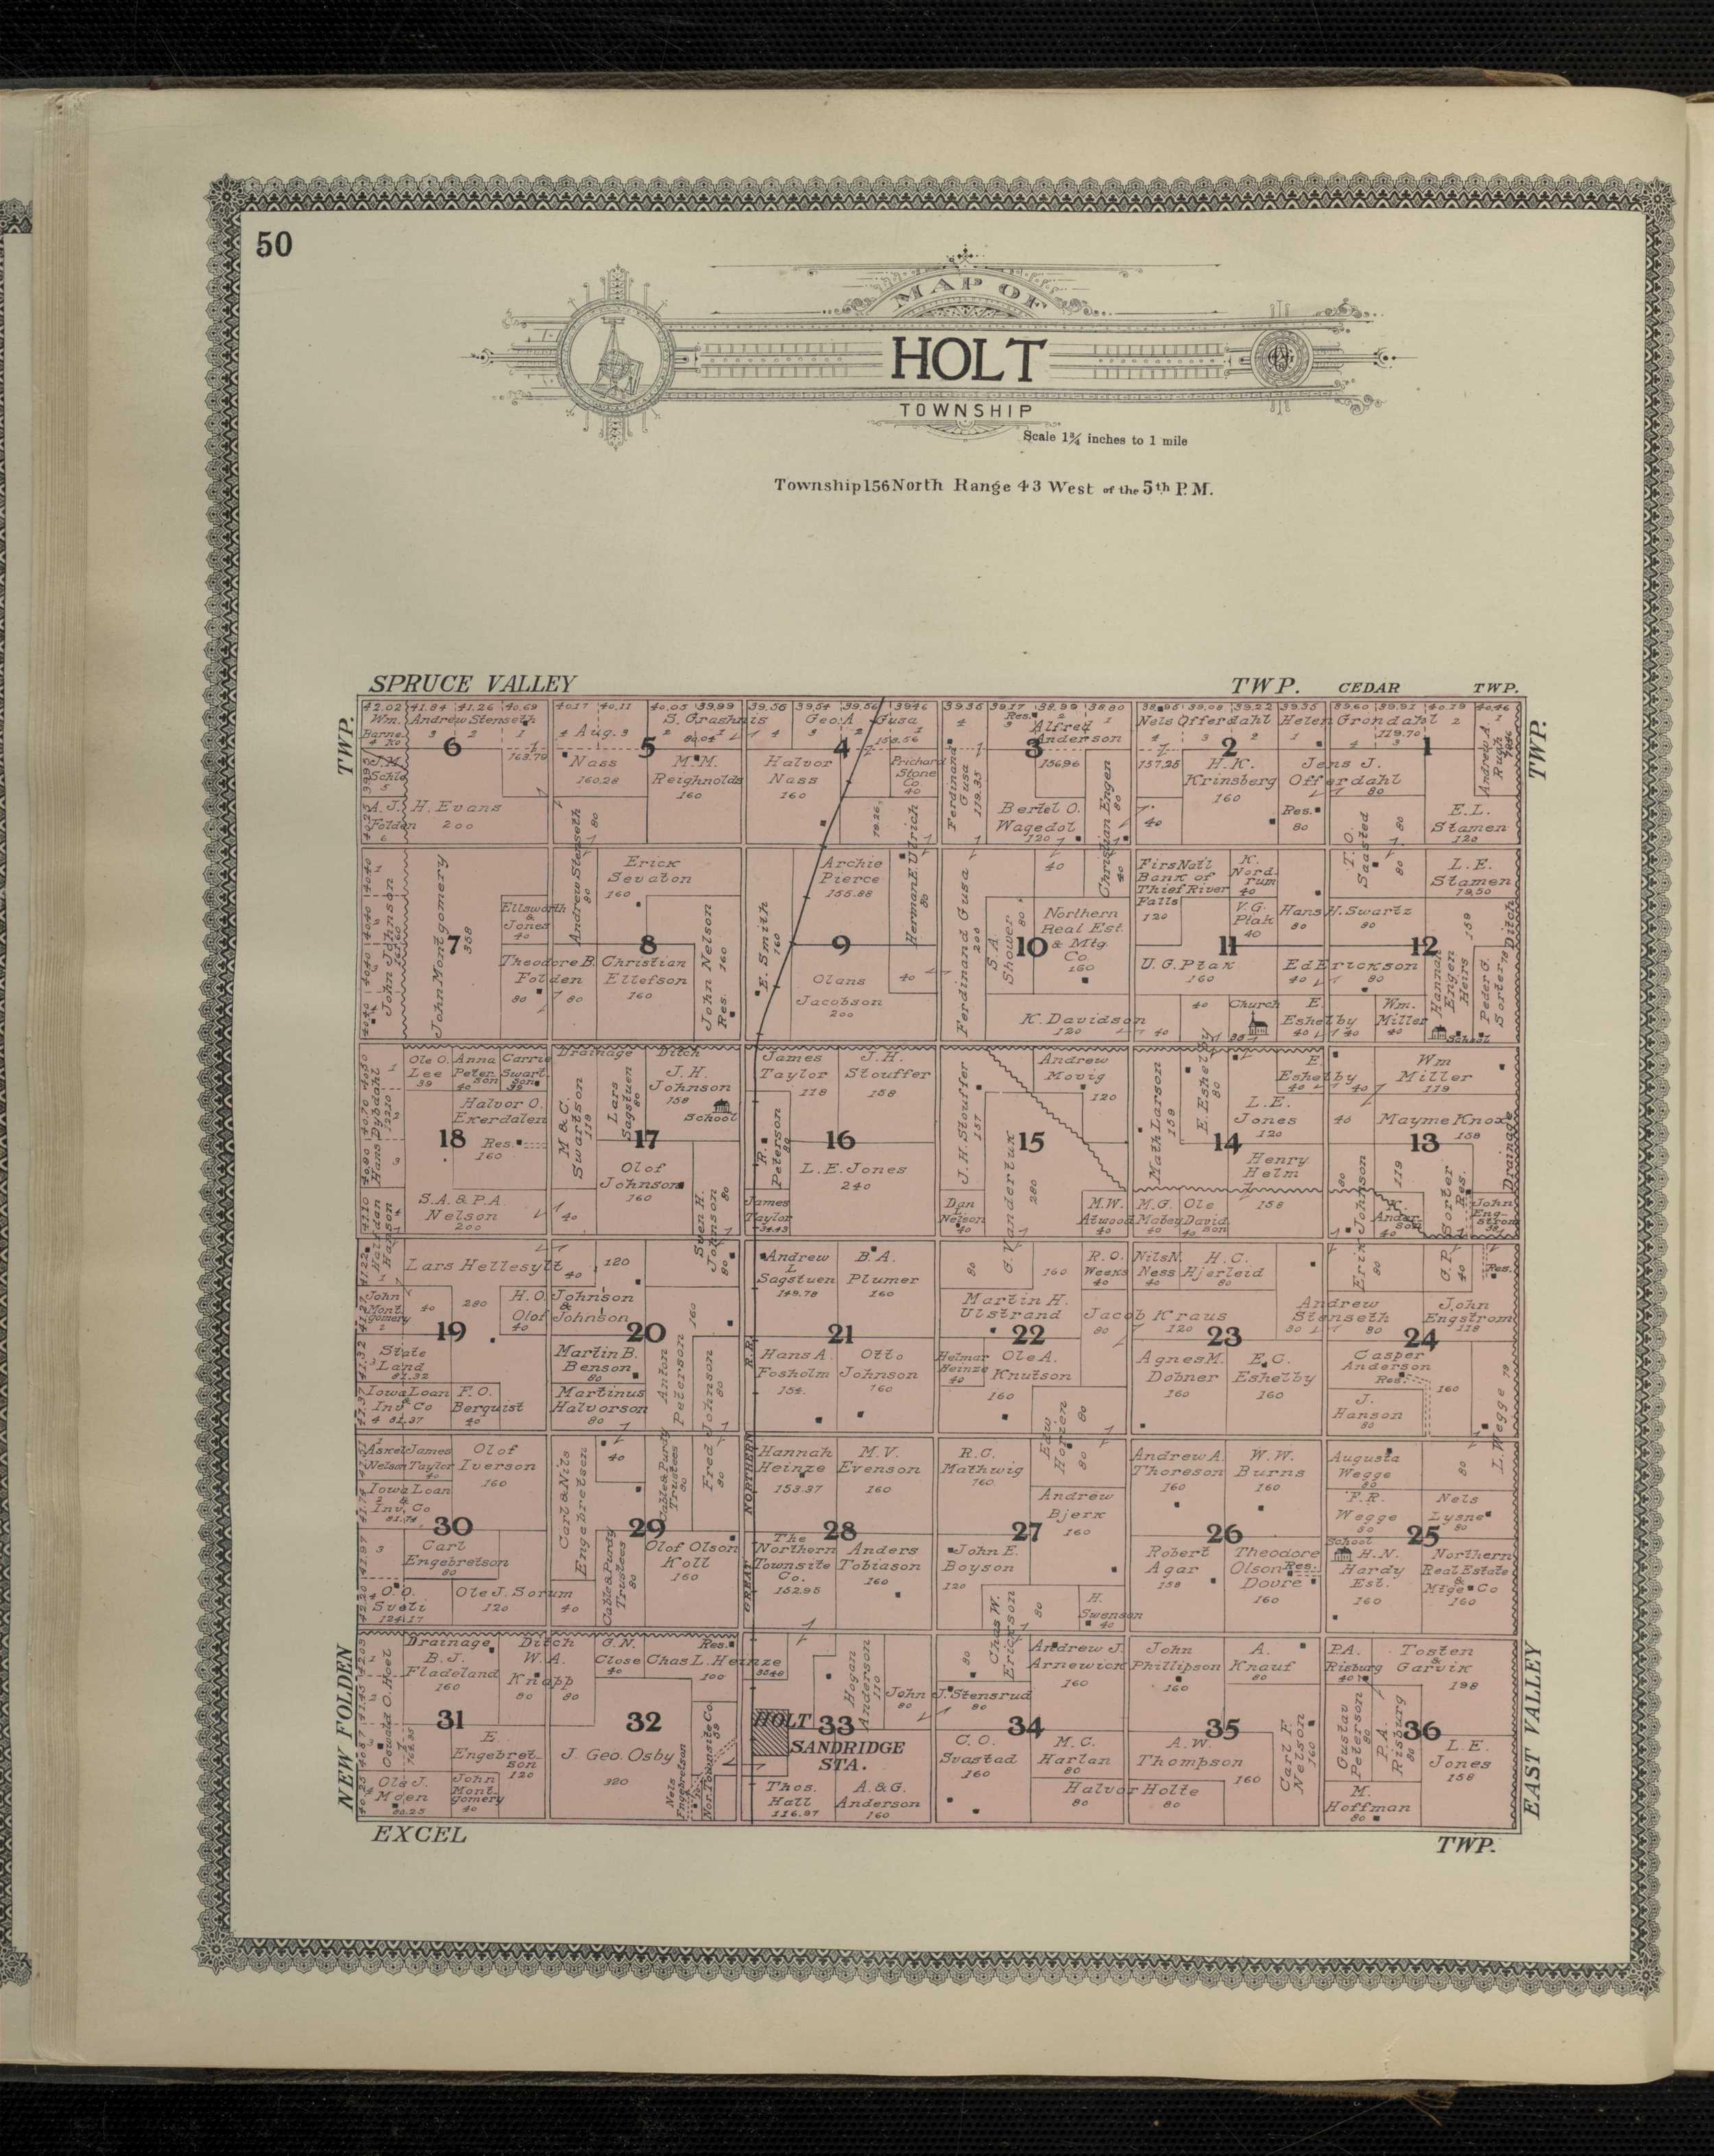 Holt Township Plat map 1909